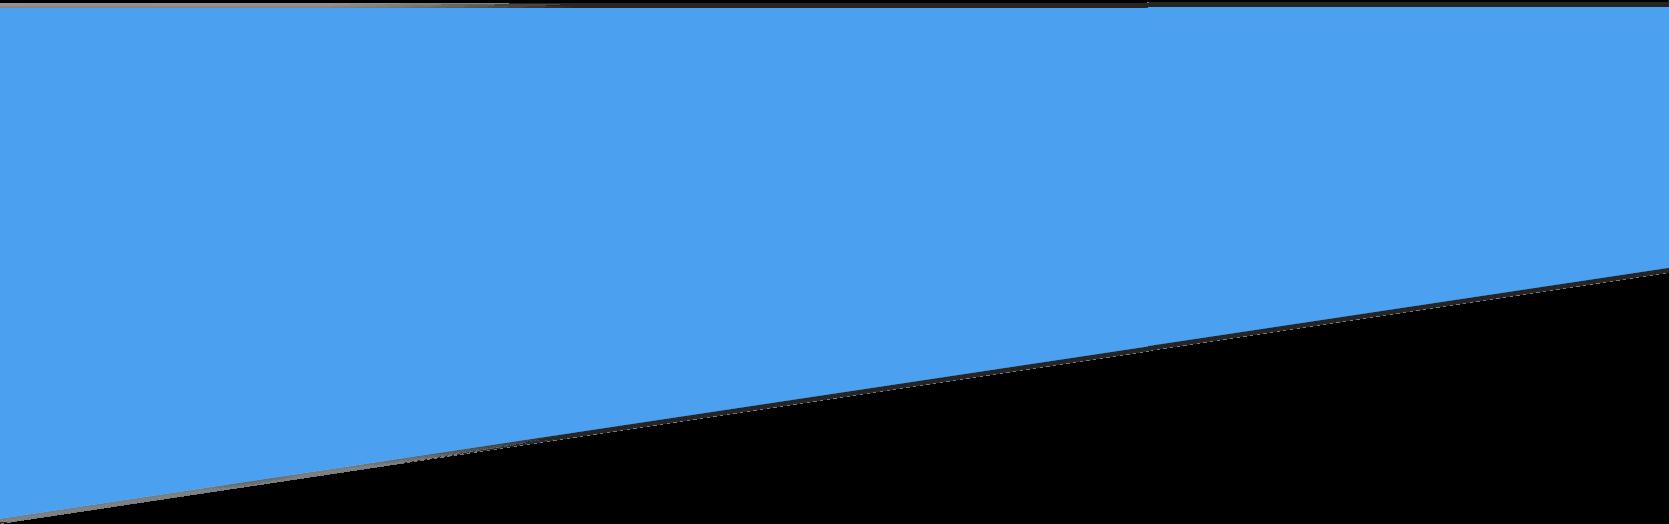 Aplifisa